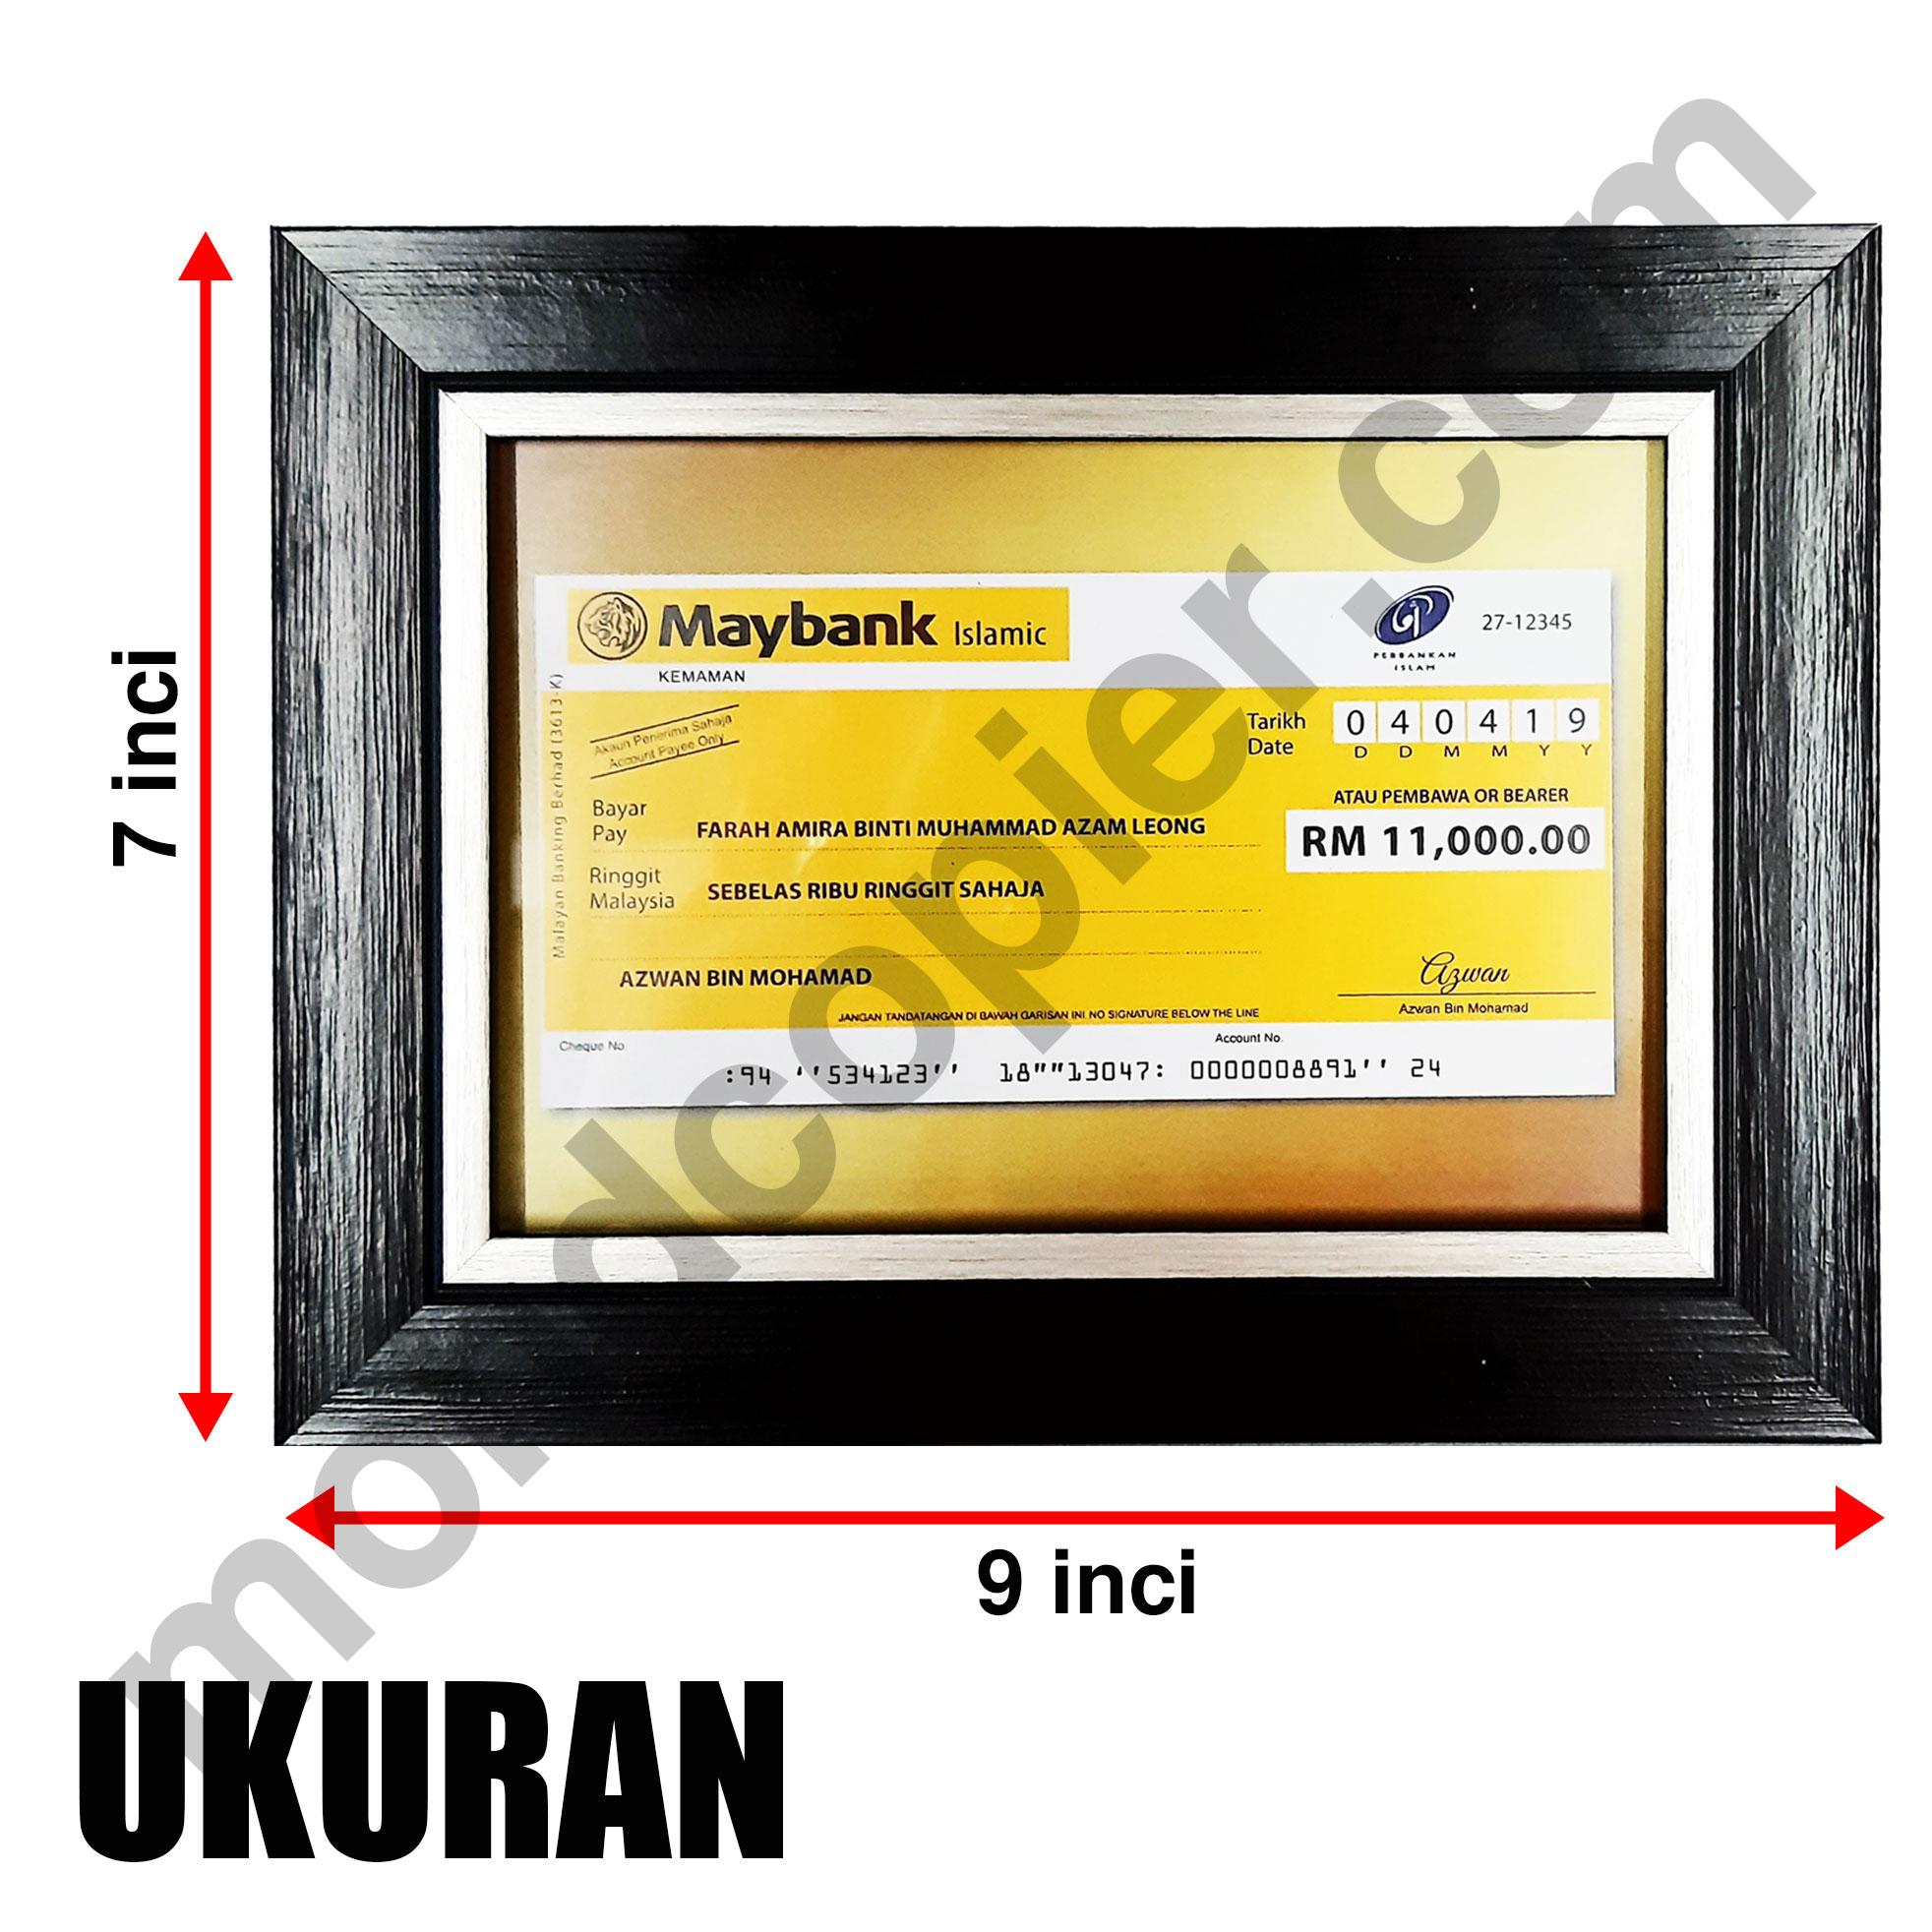 https://www.mohdcopier.com/images/products_gallery_images/Ukuran-Shopee.jpg